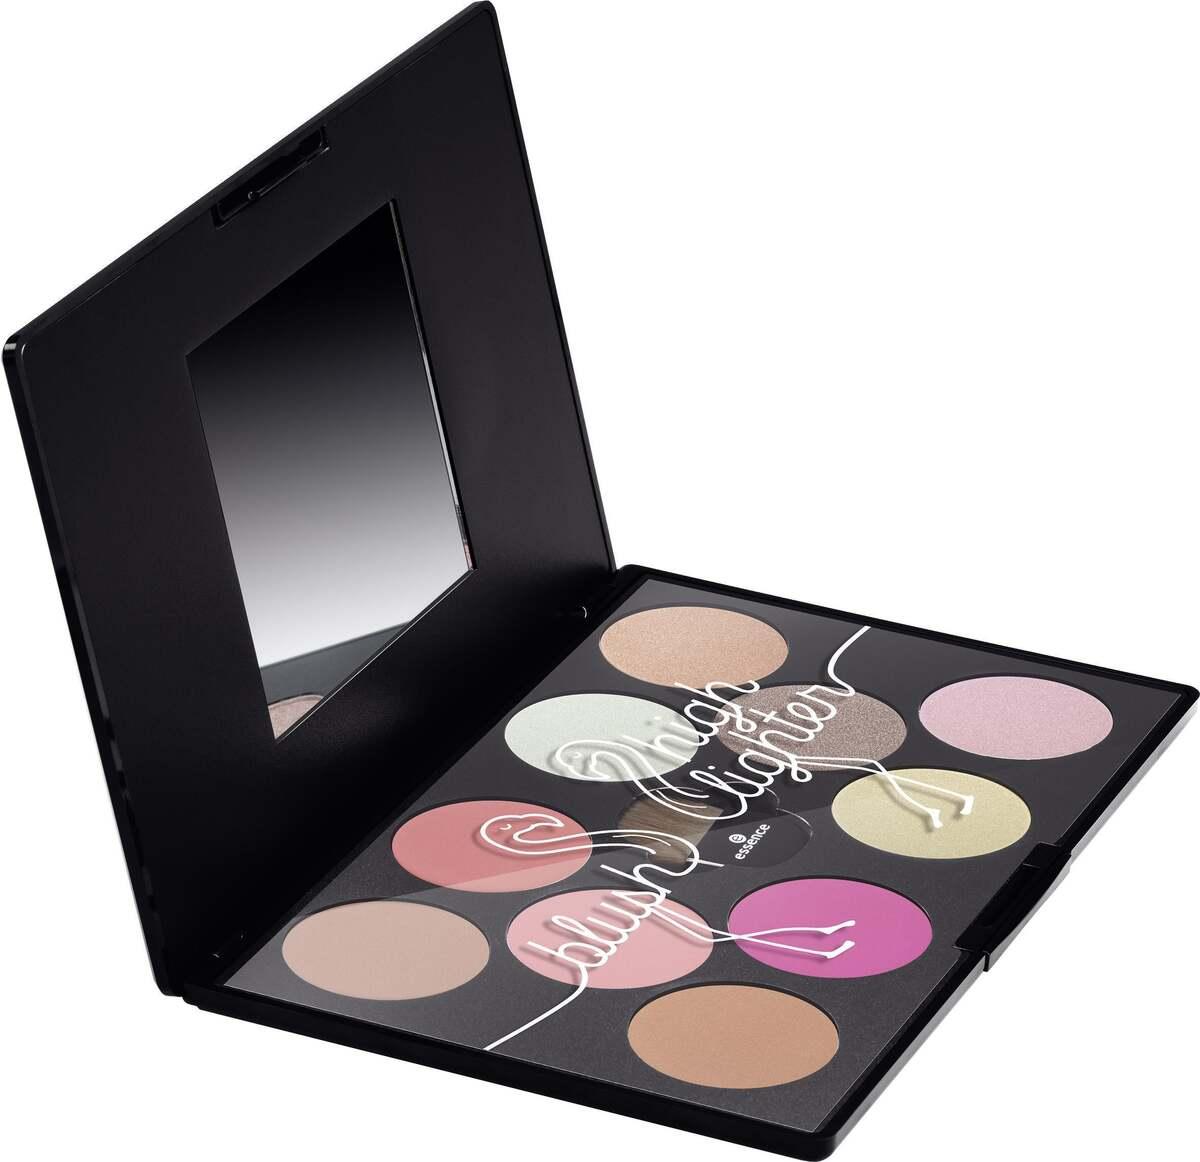 Bild 3 von essence flamingoparadise blush and highlighter palette 26.98 EUR/100 g